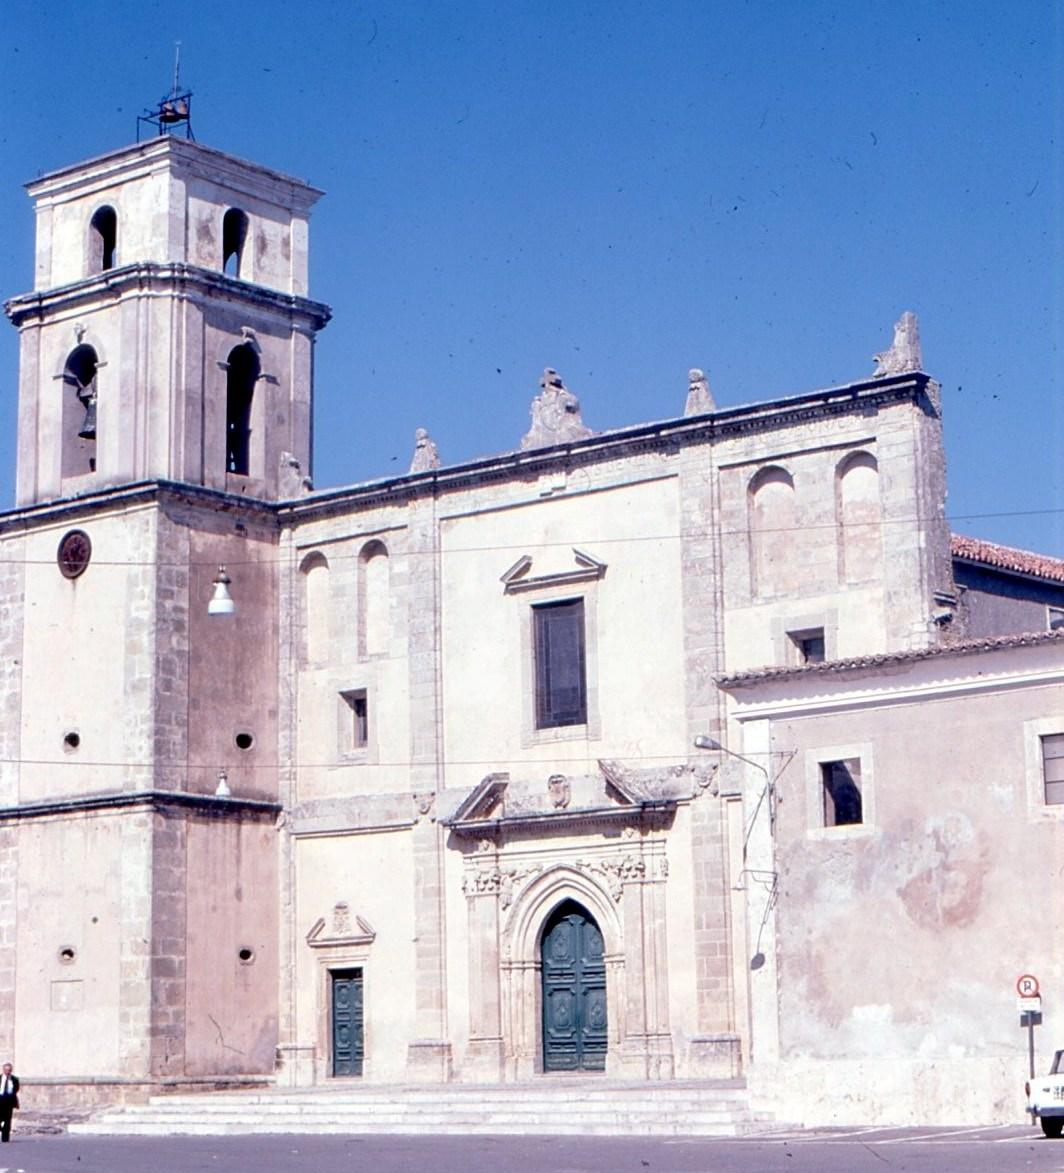 Santa Severina Facciata e Campanile